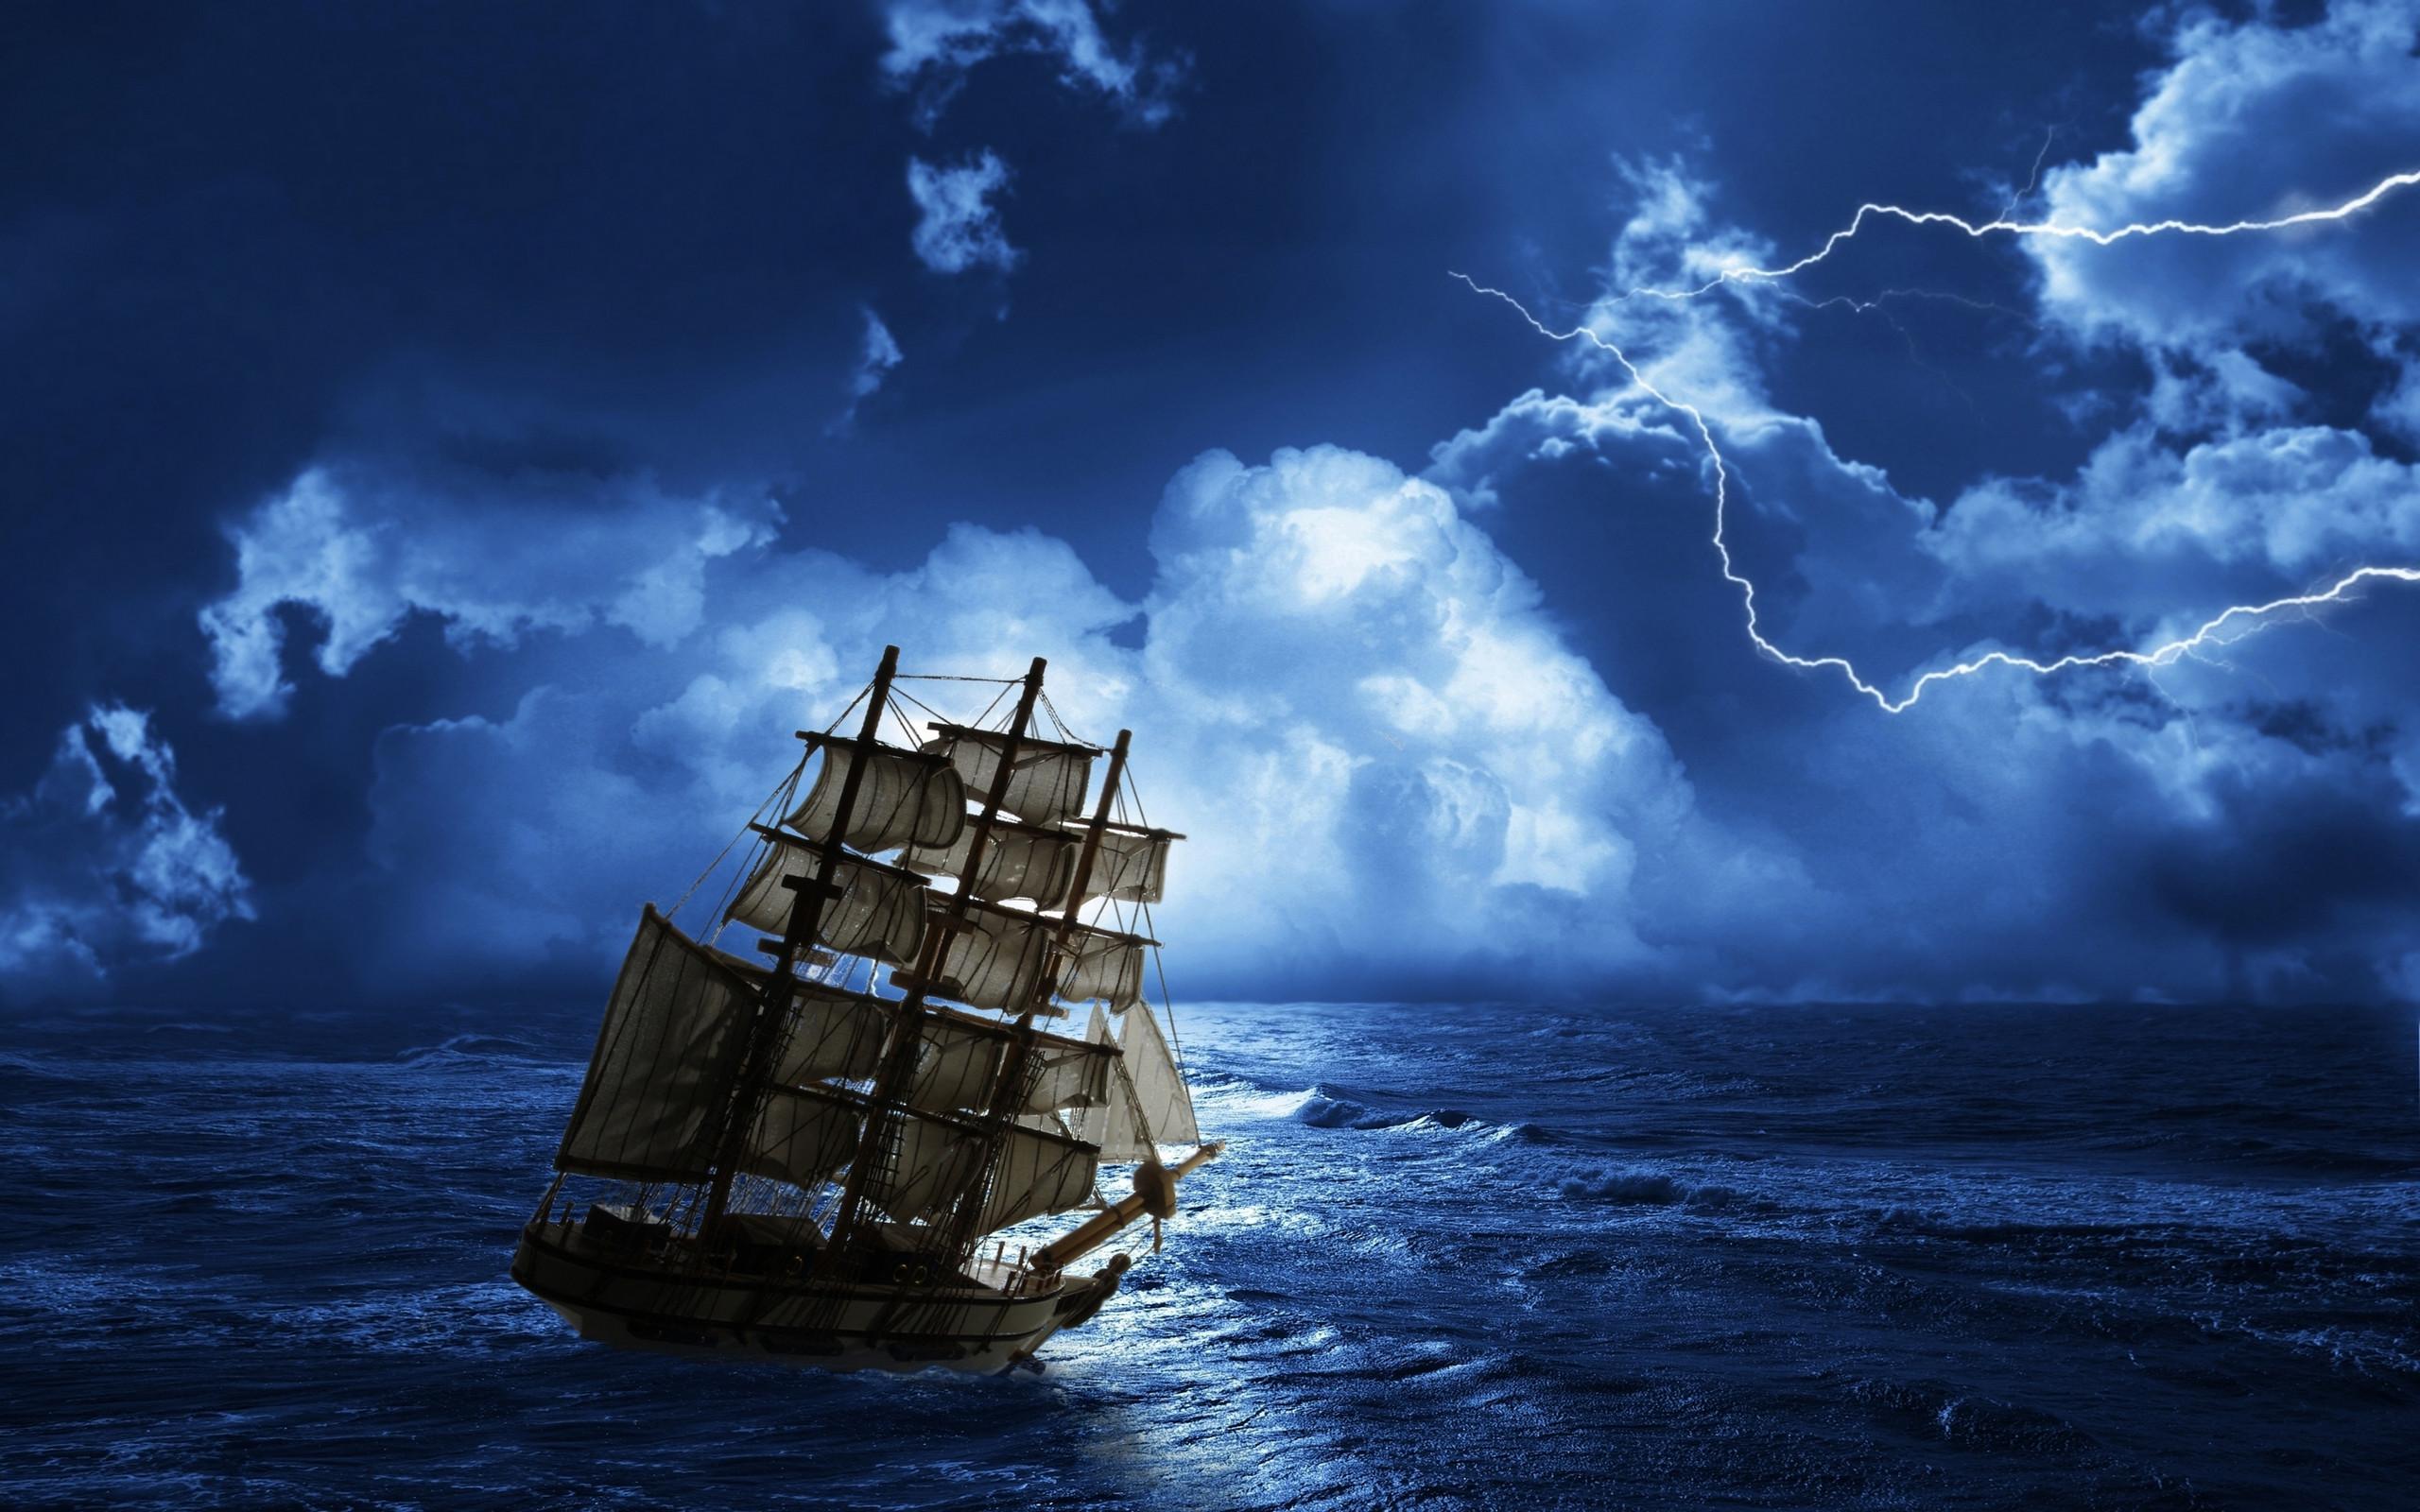 Stormy Seas wallpaper free